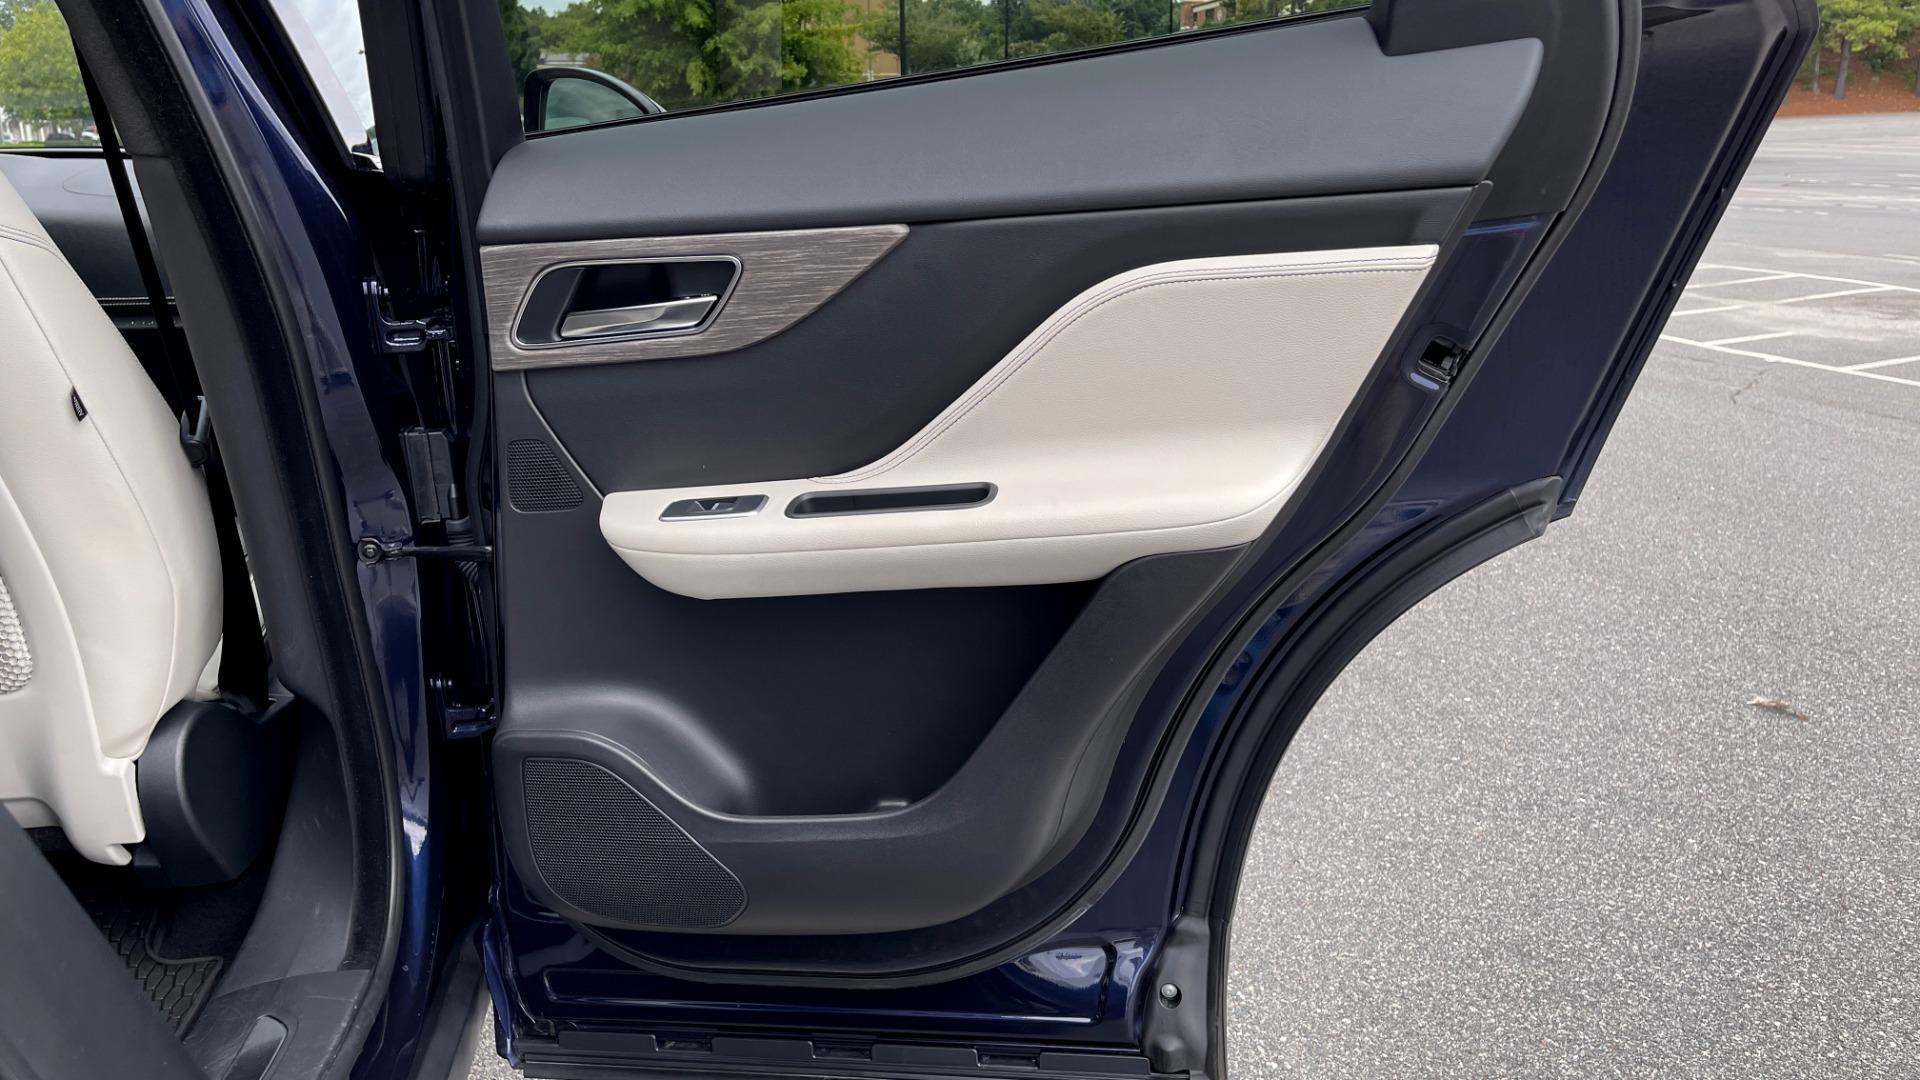 Used 2019 Jaguar F-PACE S / DRIVE PKG / BSA / HUD / BLACK EXT PKG / REARVIEW for sale $50,995 at Formula Imports in Charlotte NC 28227 57